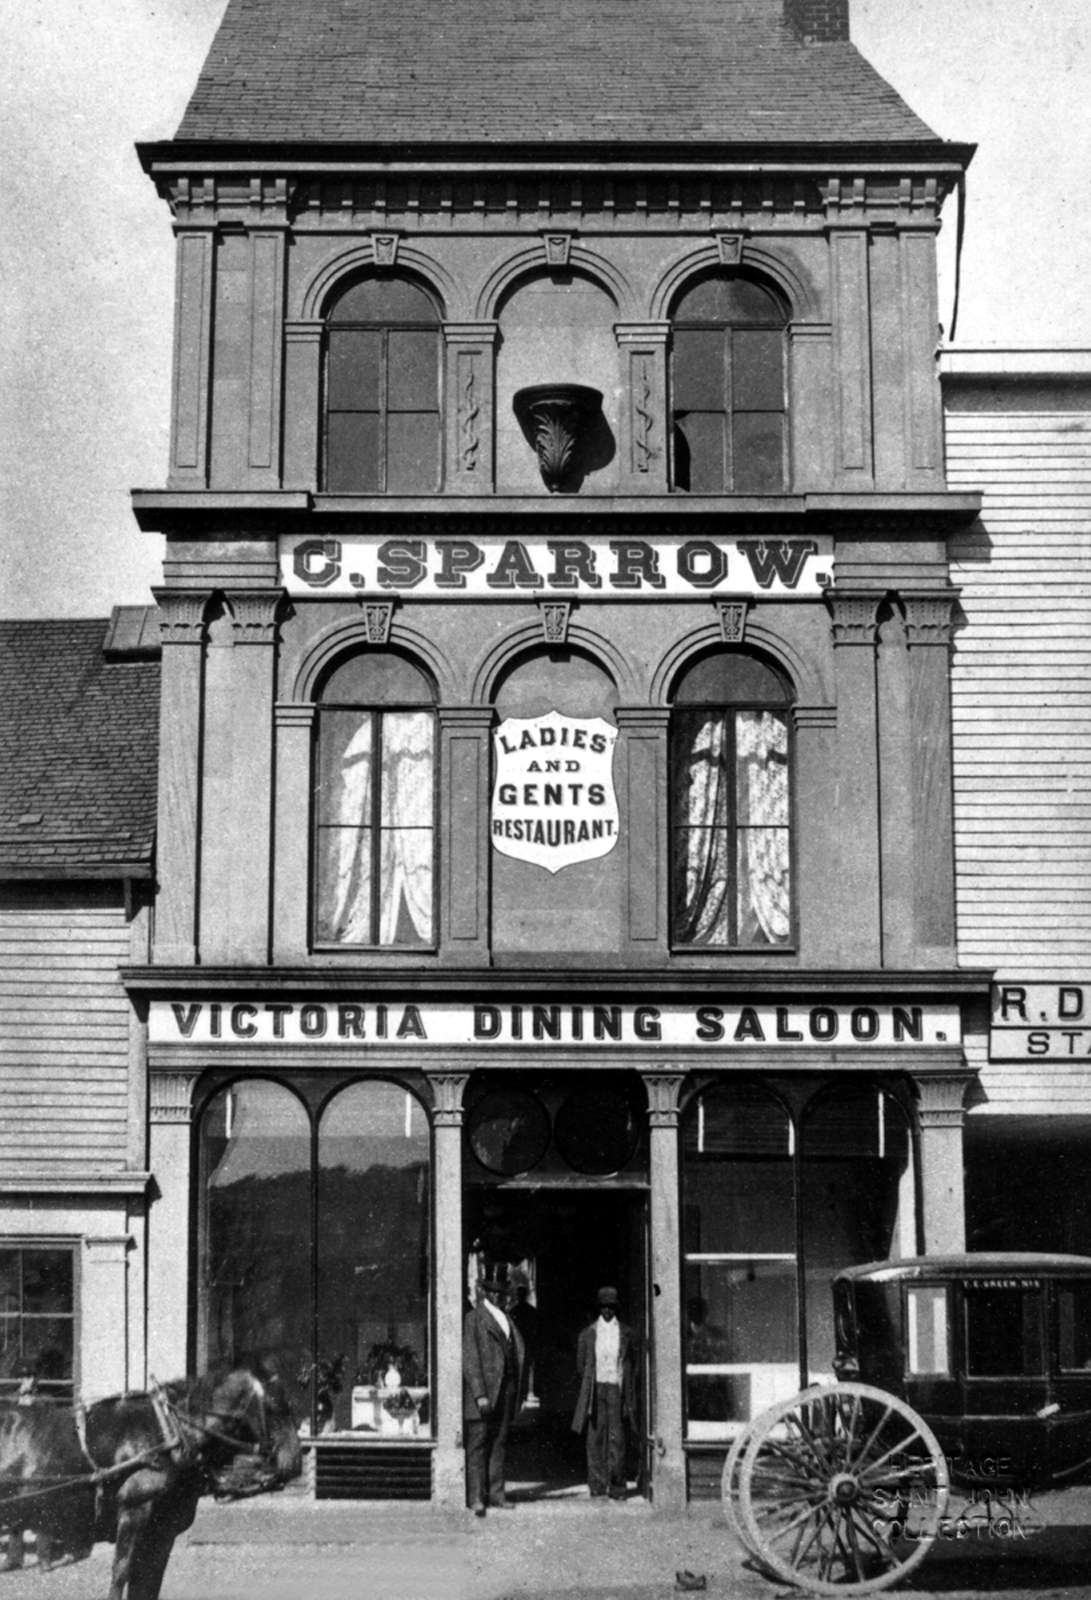 Cornelius Sparrow in front of the Victoria Dining Saloon on Germain Street in Saint John on June 20, 1877. (Heritage Resources Saint John)